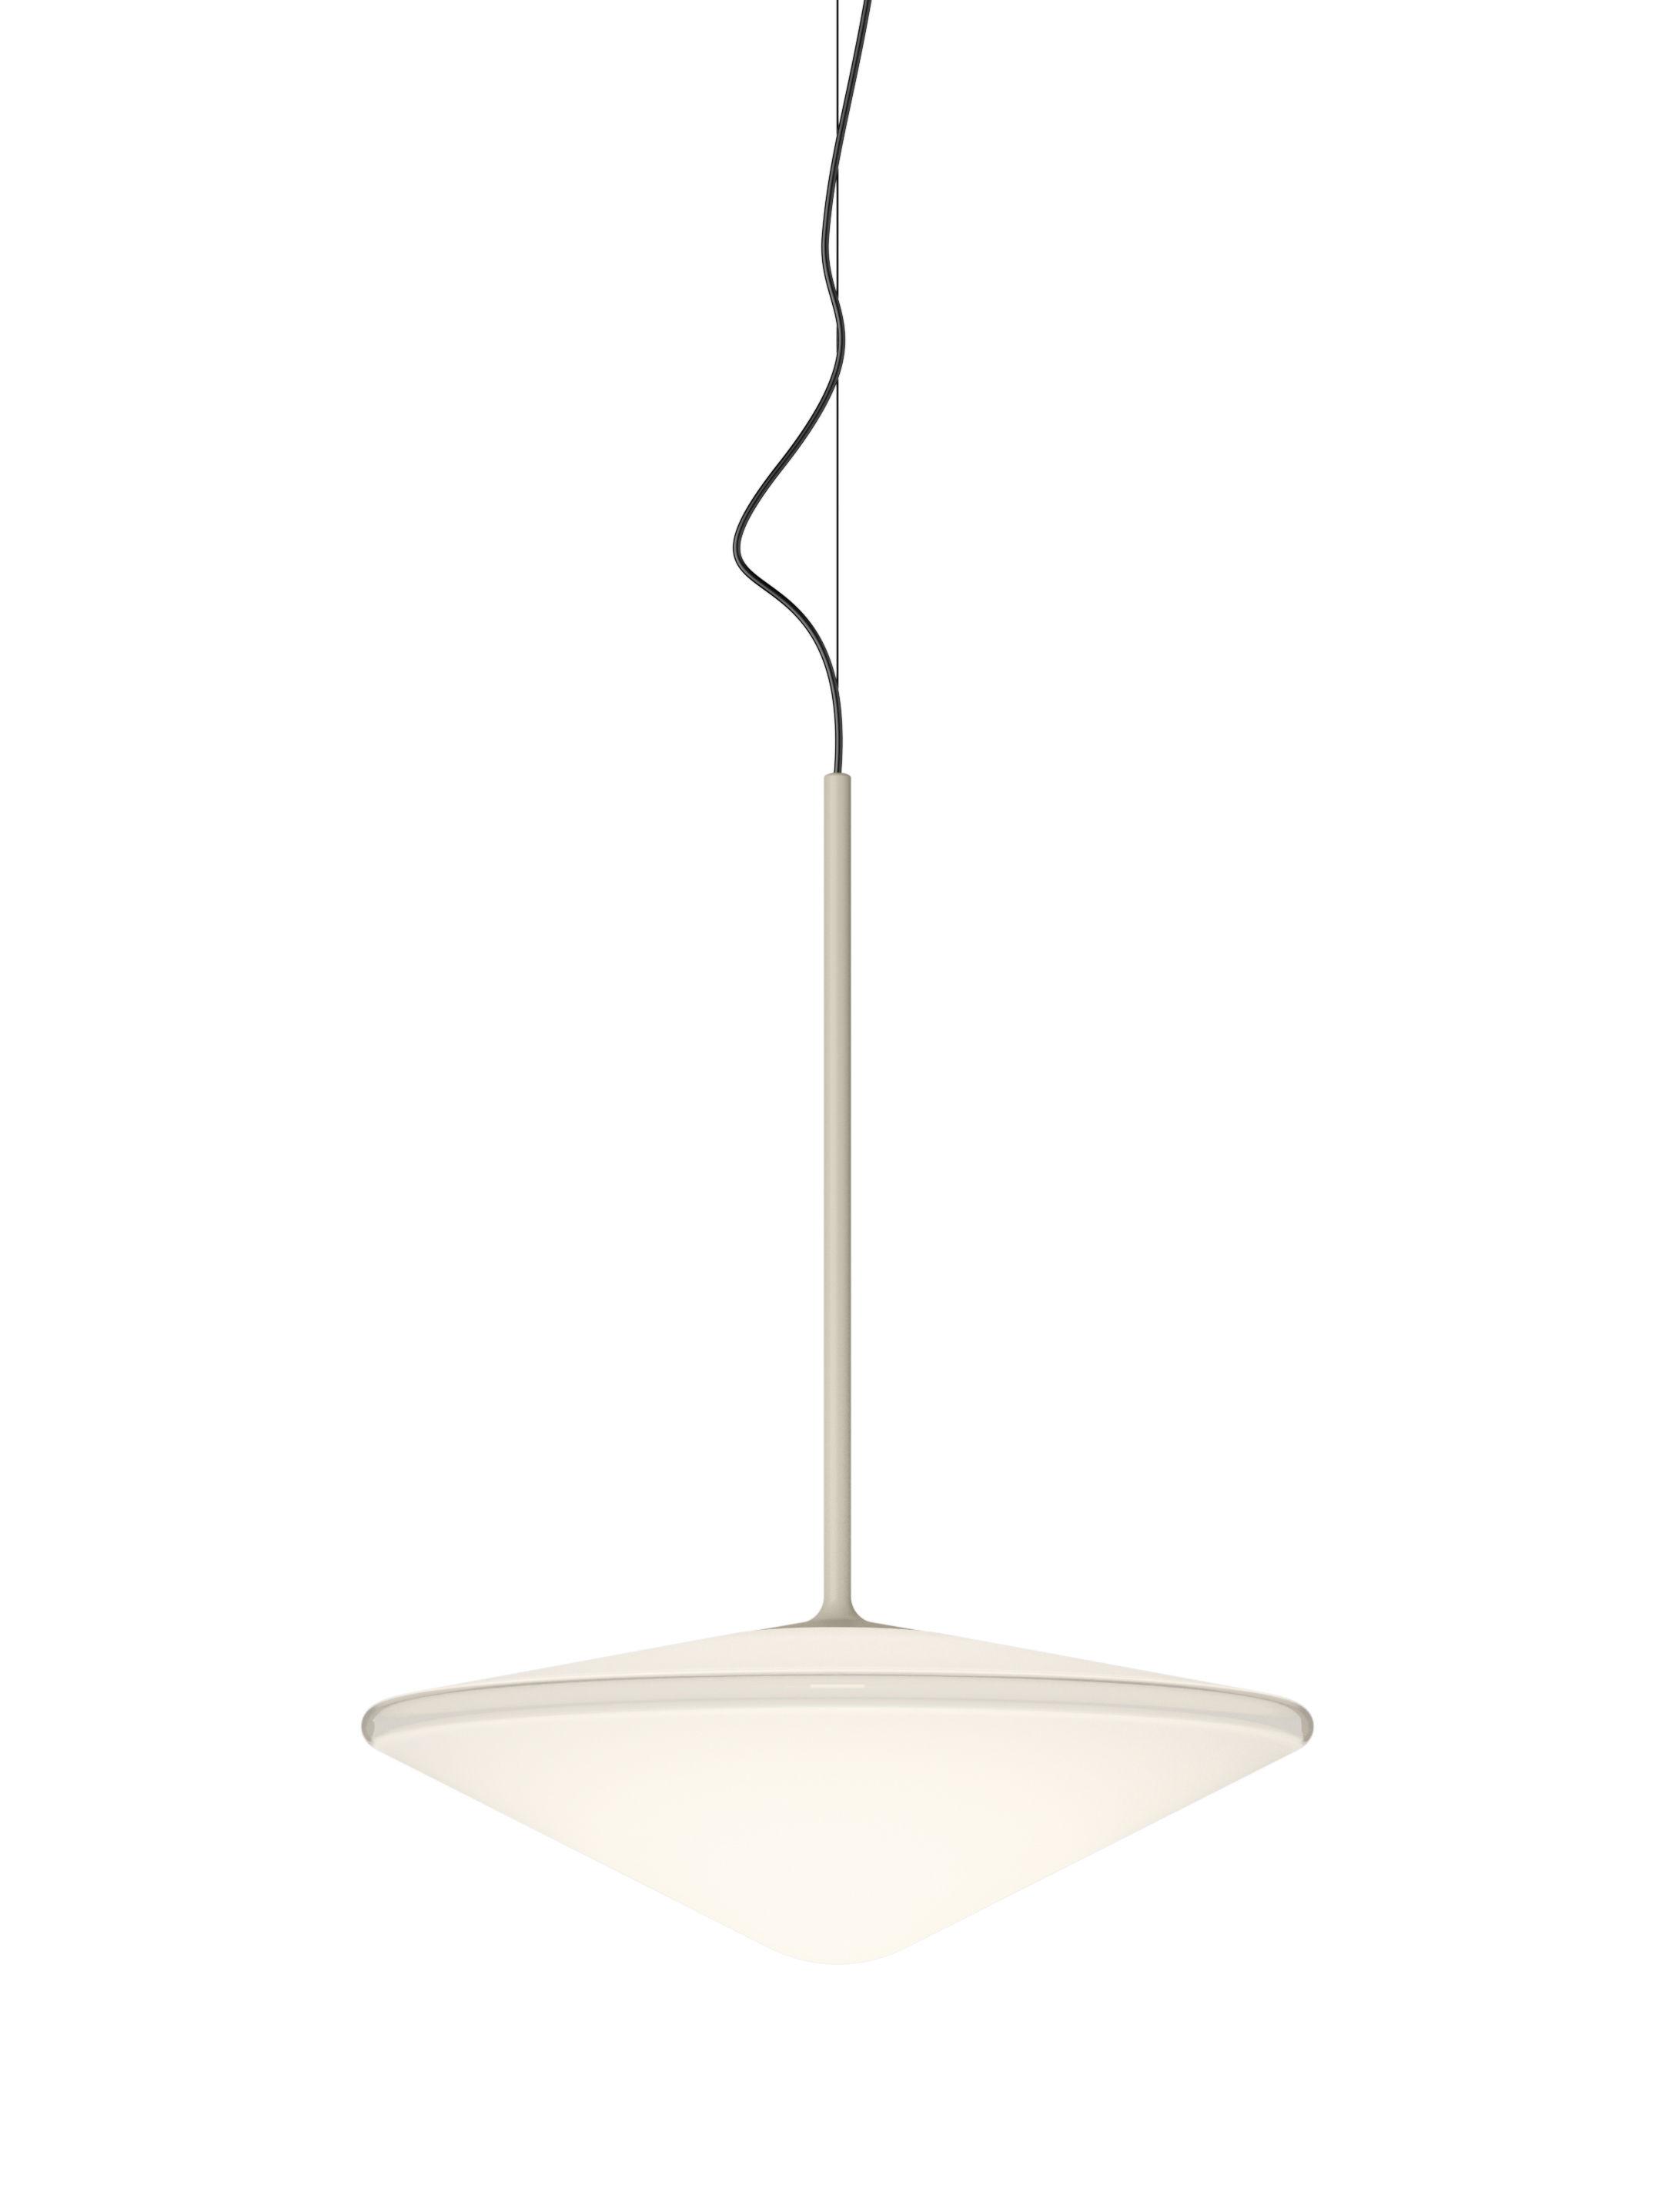 Leuchten - Pendelleuchten - Tempo Triangle Pendelleuchte / LED - Ø 35 cm - Vibia - Beige - geblasenes Glas, klarlackbeschichtetes Aluminium